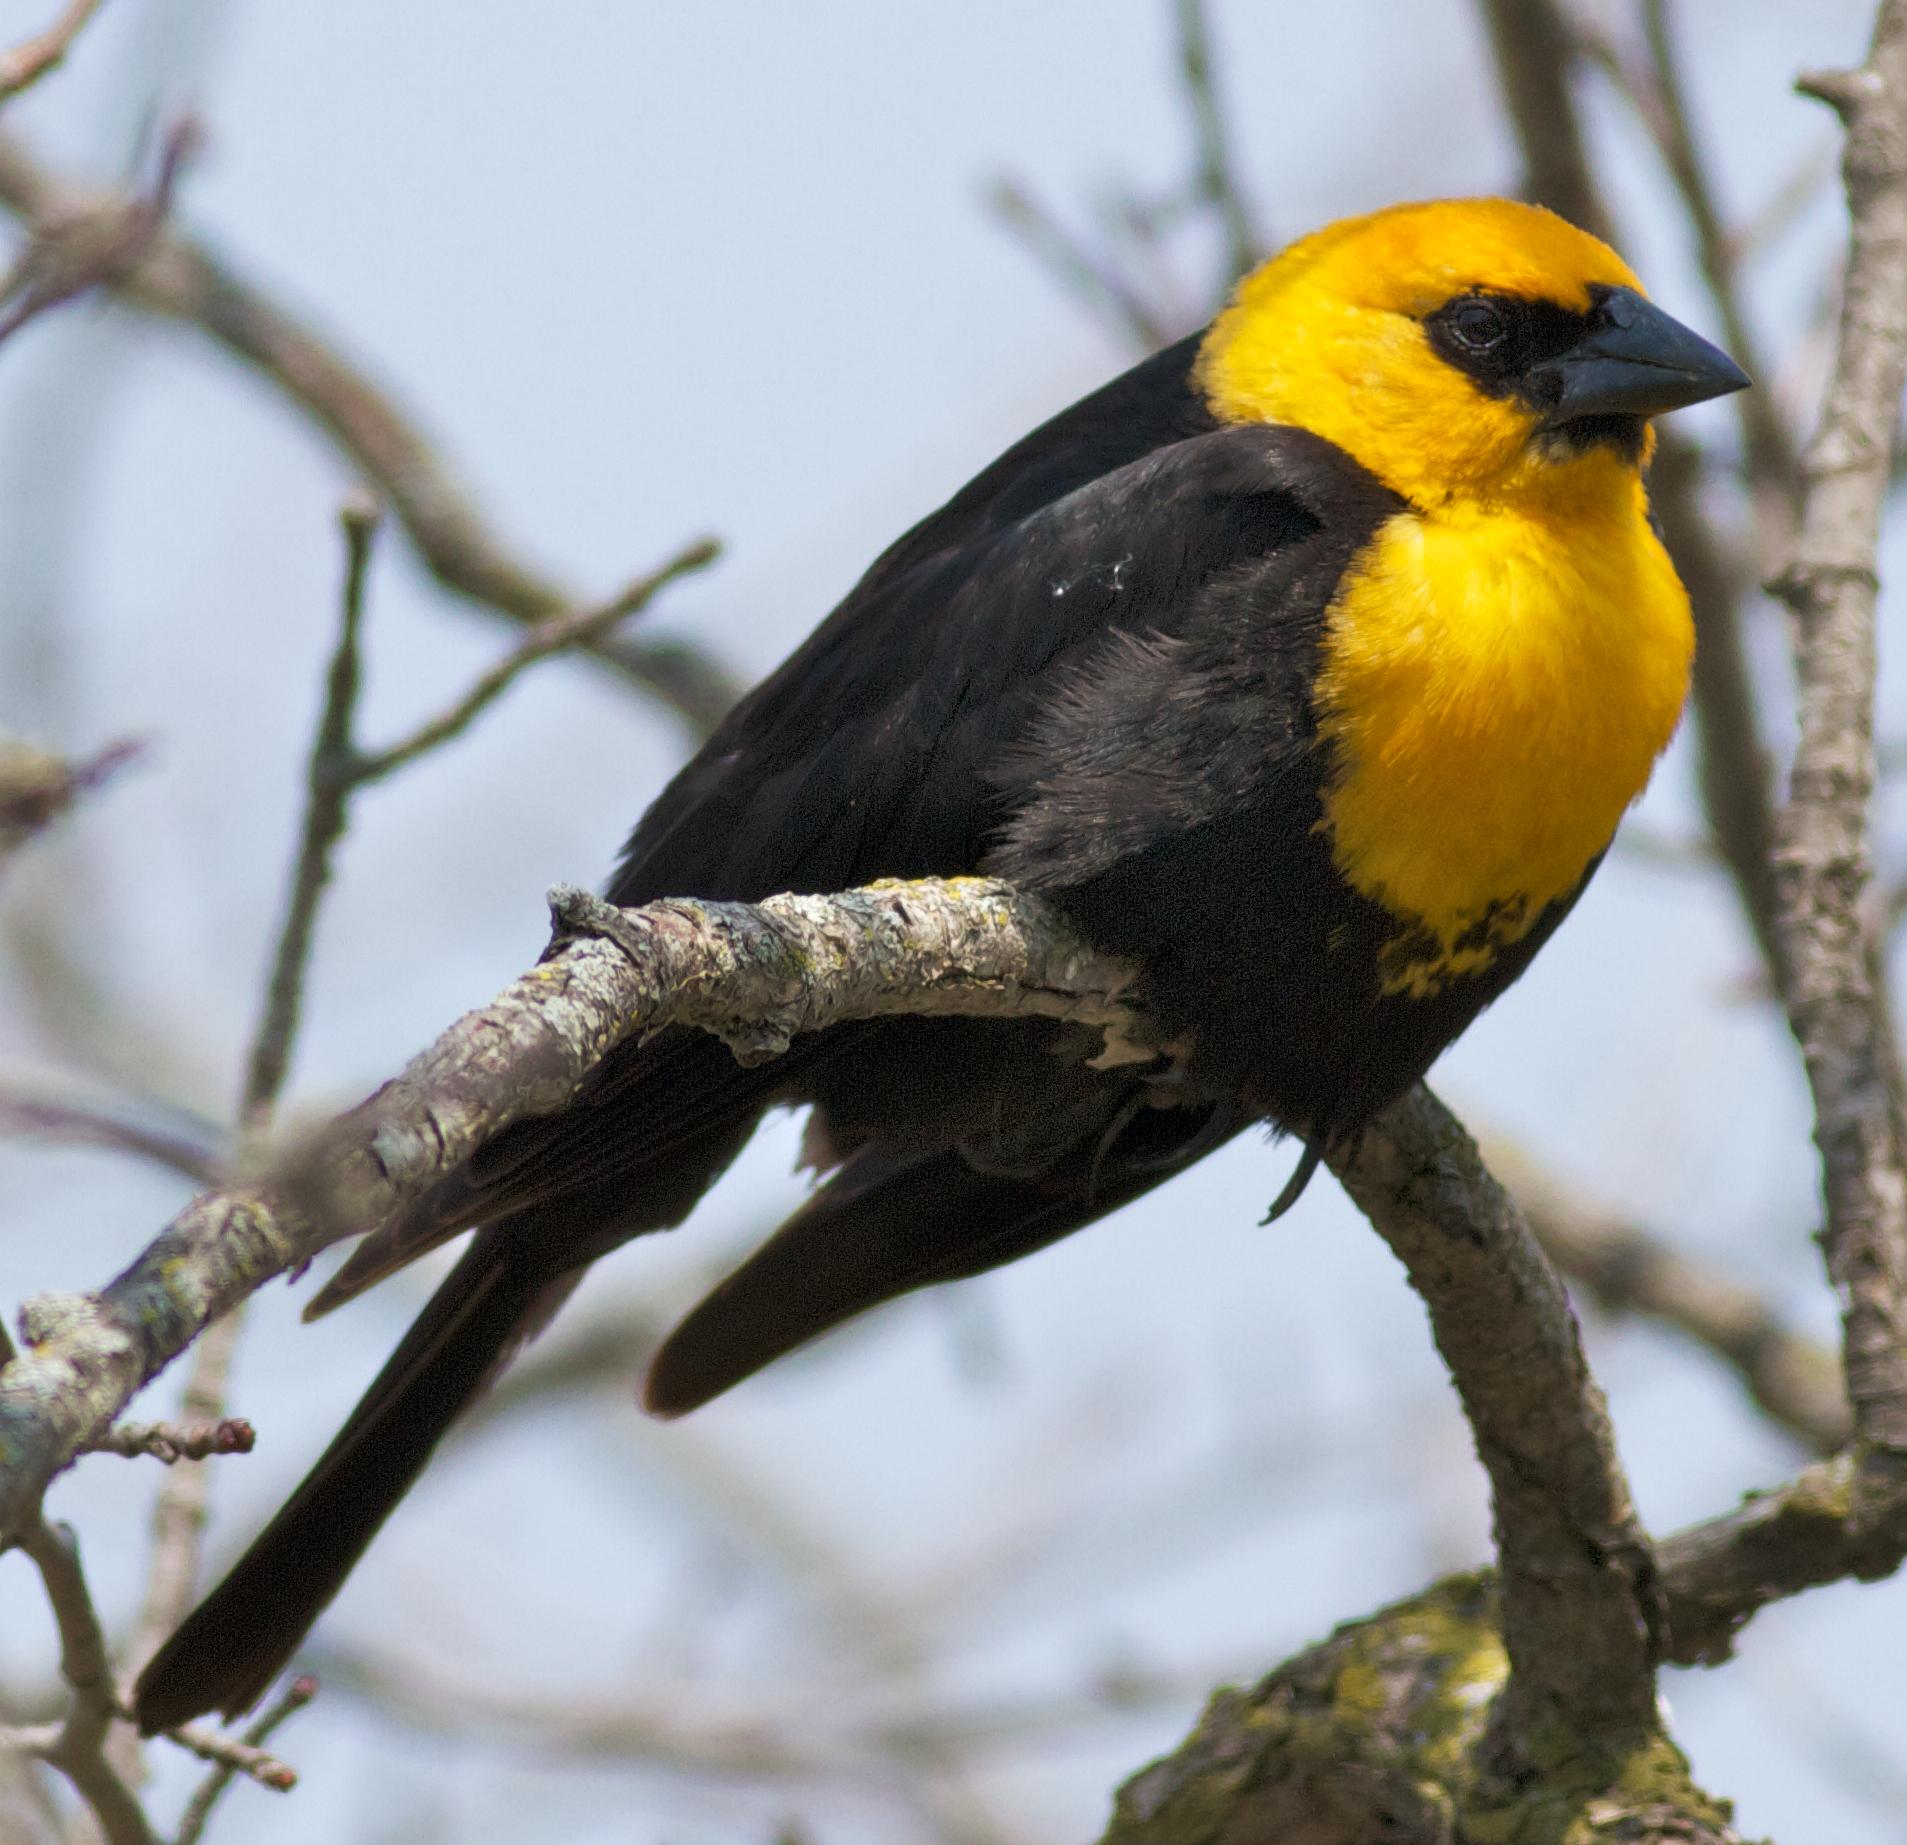 Blackbirds of Paradise - Blackbirds of Paradise